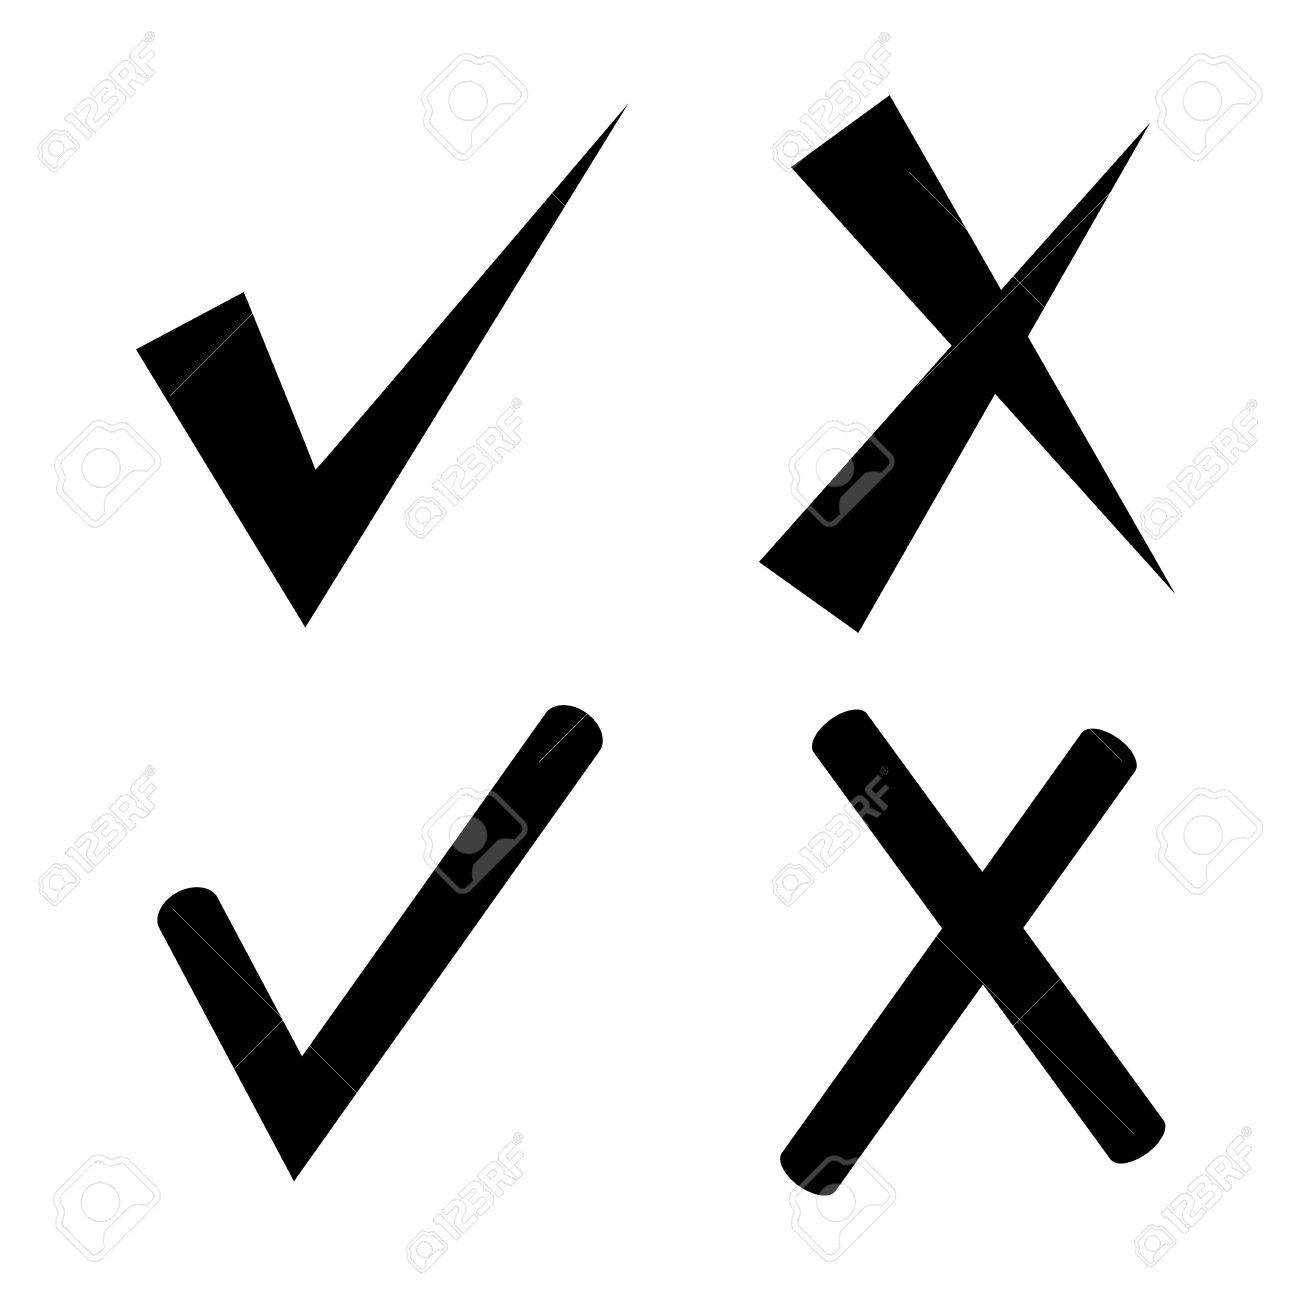 hight resolution of check mark and wrong mark stock vector 75182331